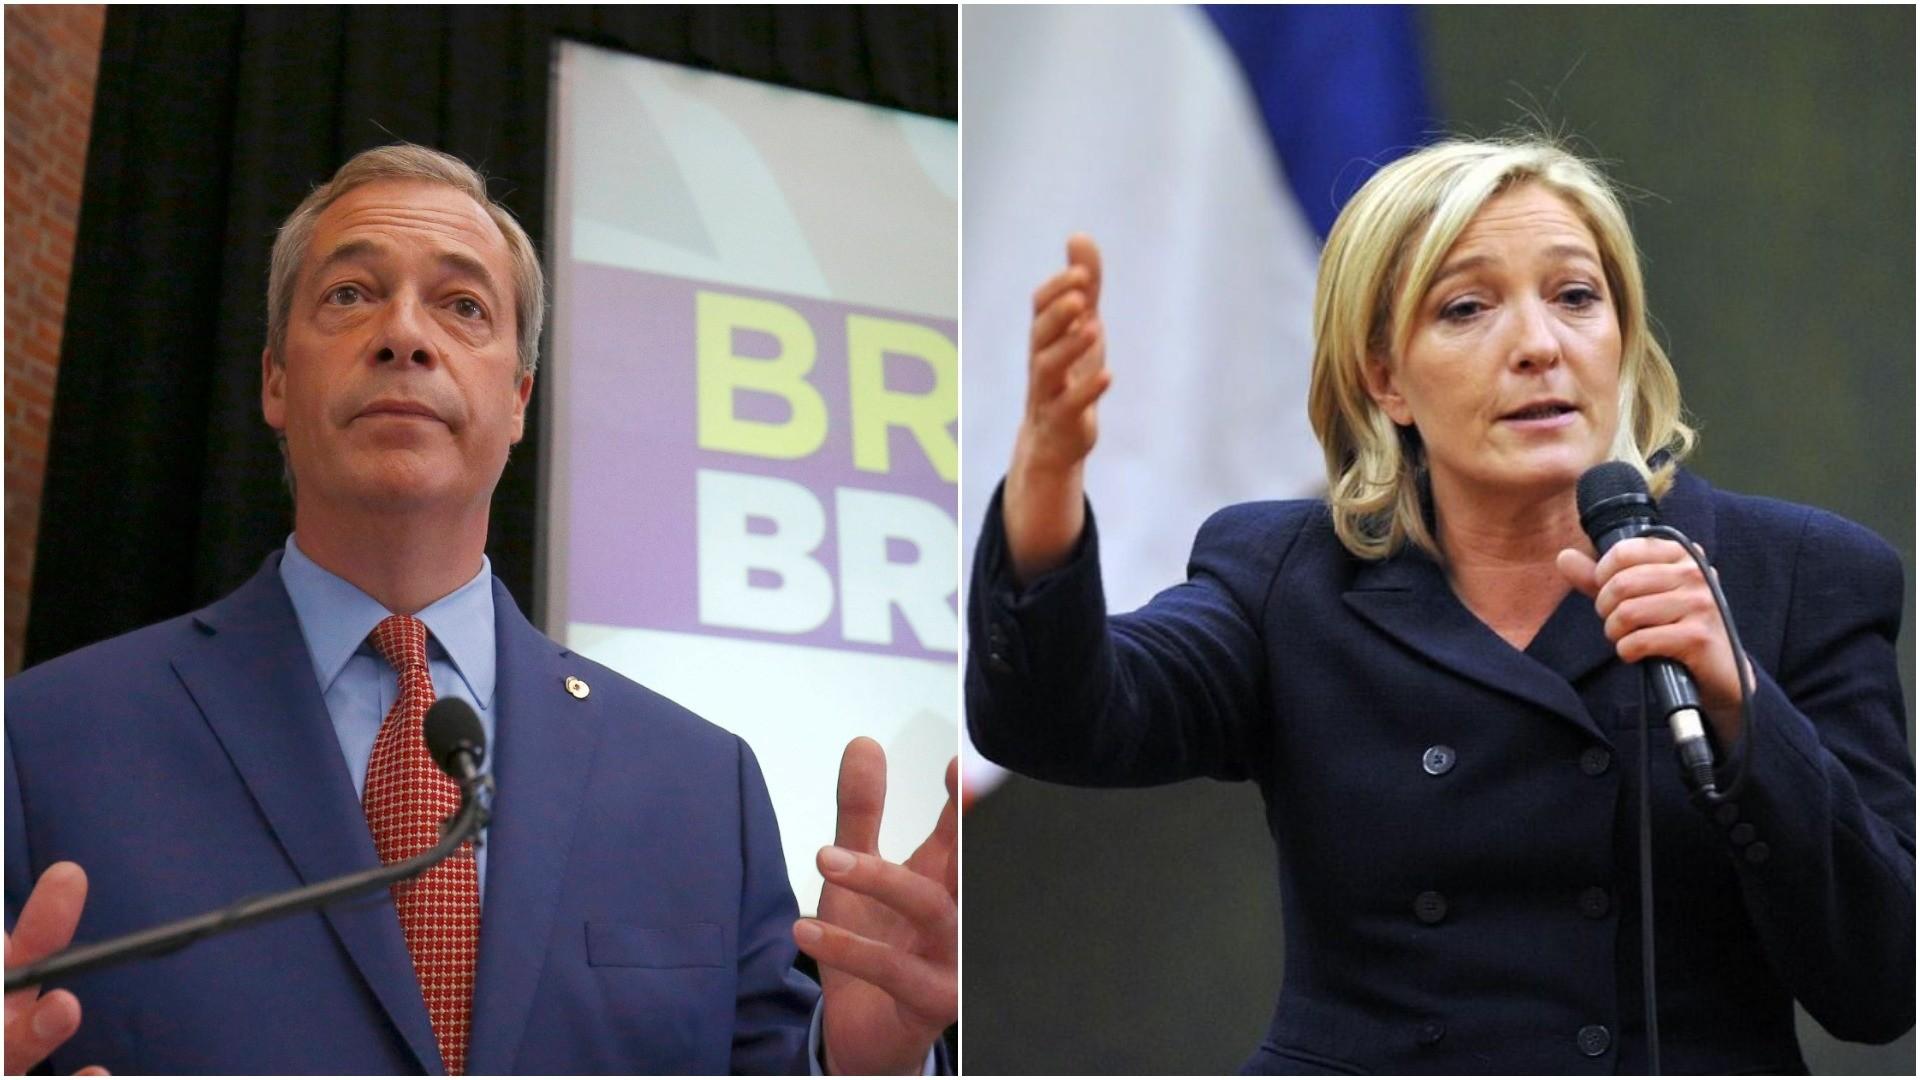 Photo combination shows former UKIP leader Nigel Farage (L) and National Front party leader Marine Le Pen.